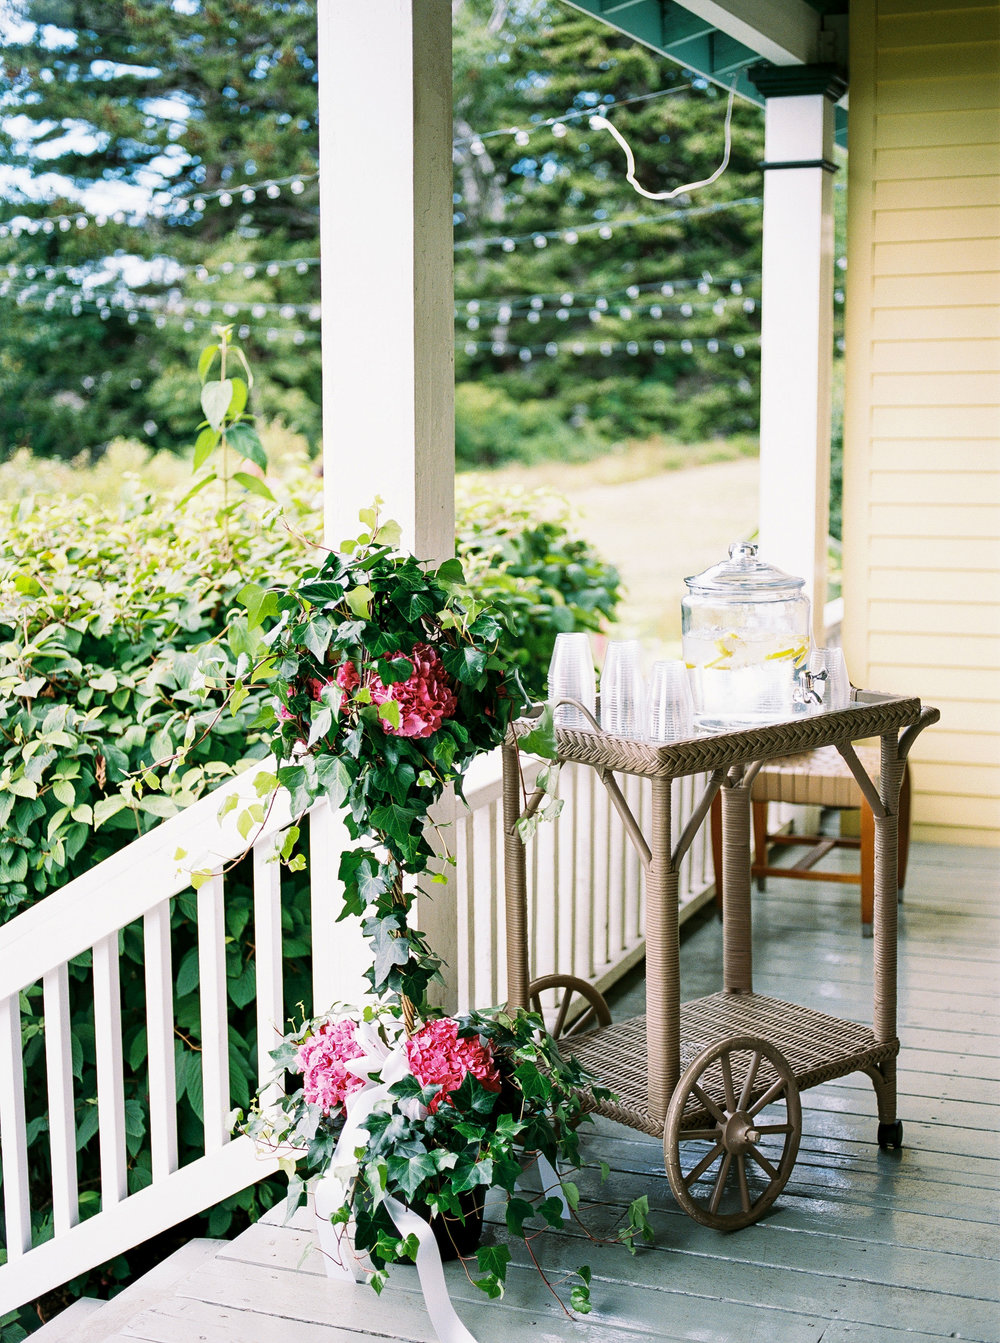 Alexandra-Elise-Photography-Ali-Reed-Chebeague-Island-Maine-Film-Wedding-Photographer-Elizabeth-Josh-Wedding-Reception-011.jpg